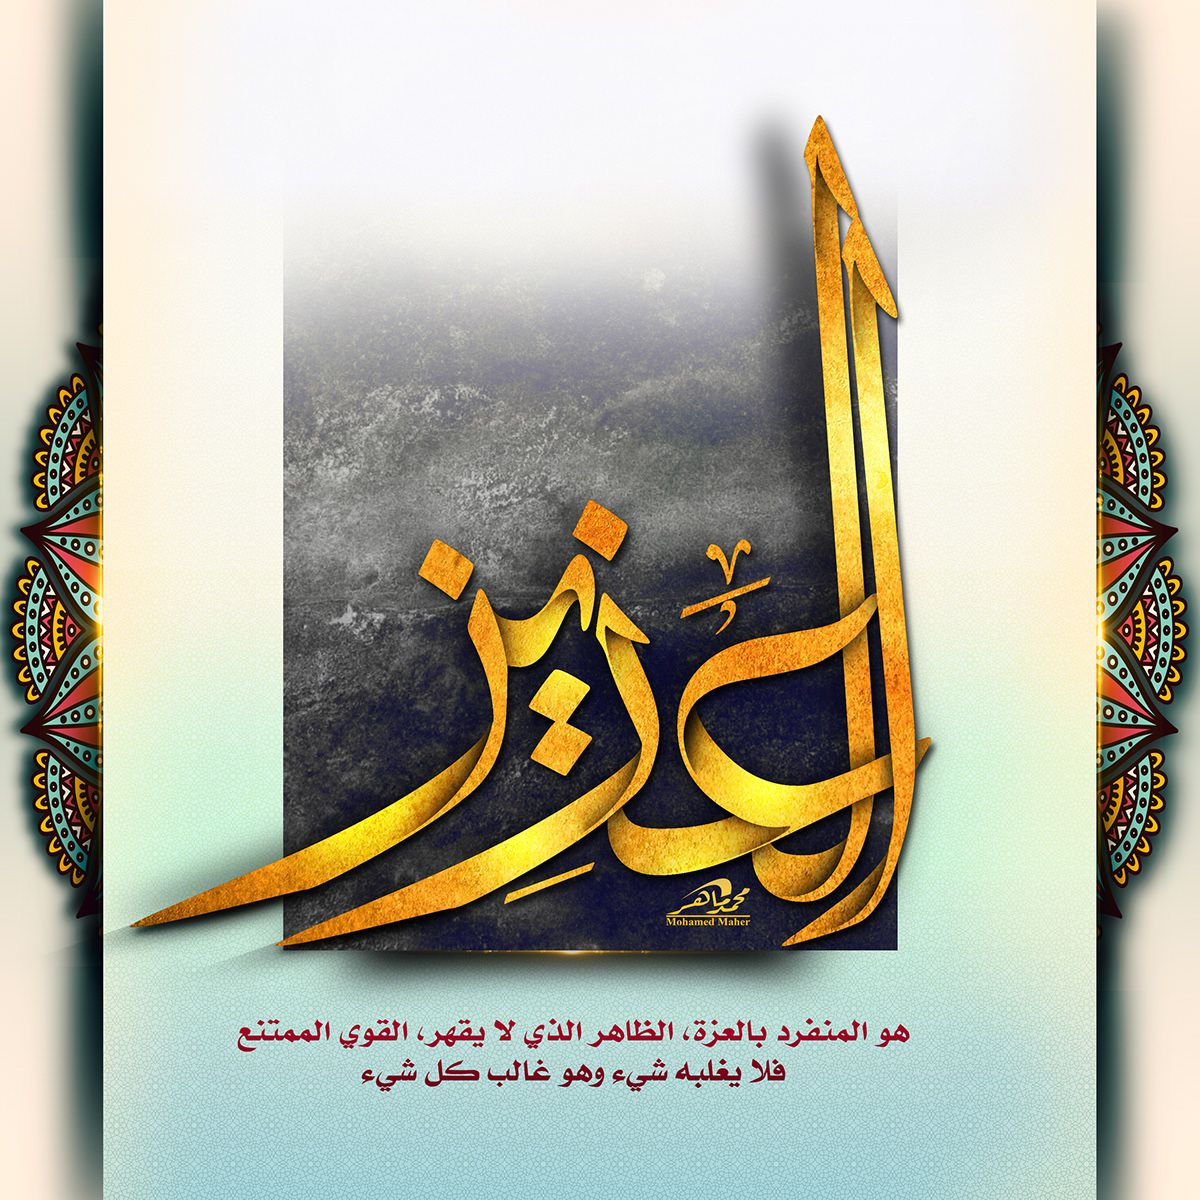 اسماء الله الحسنى مشروع متجدد On Behance Islamic Art Arabic Books Islamic Quotes Quran